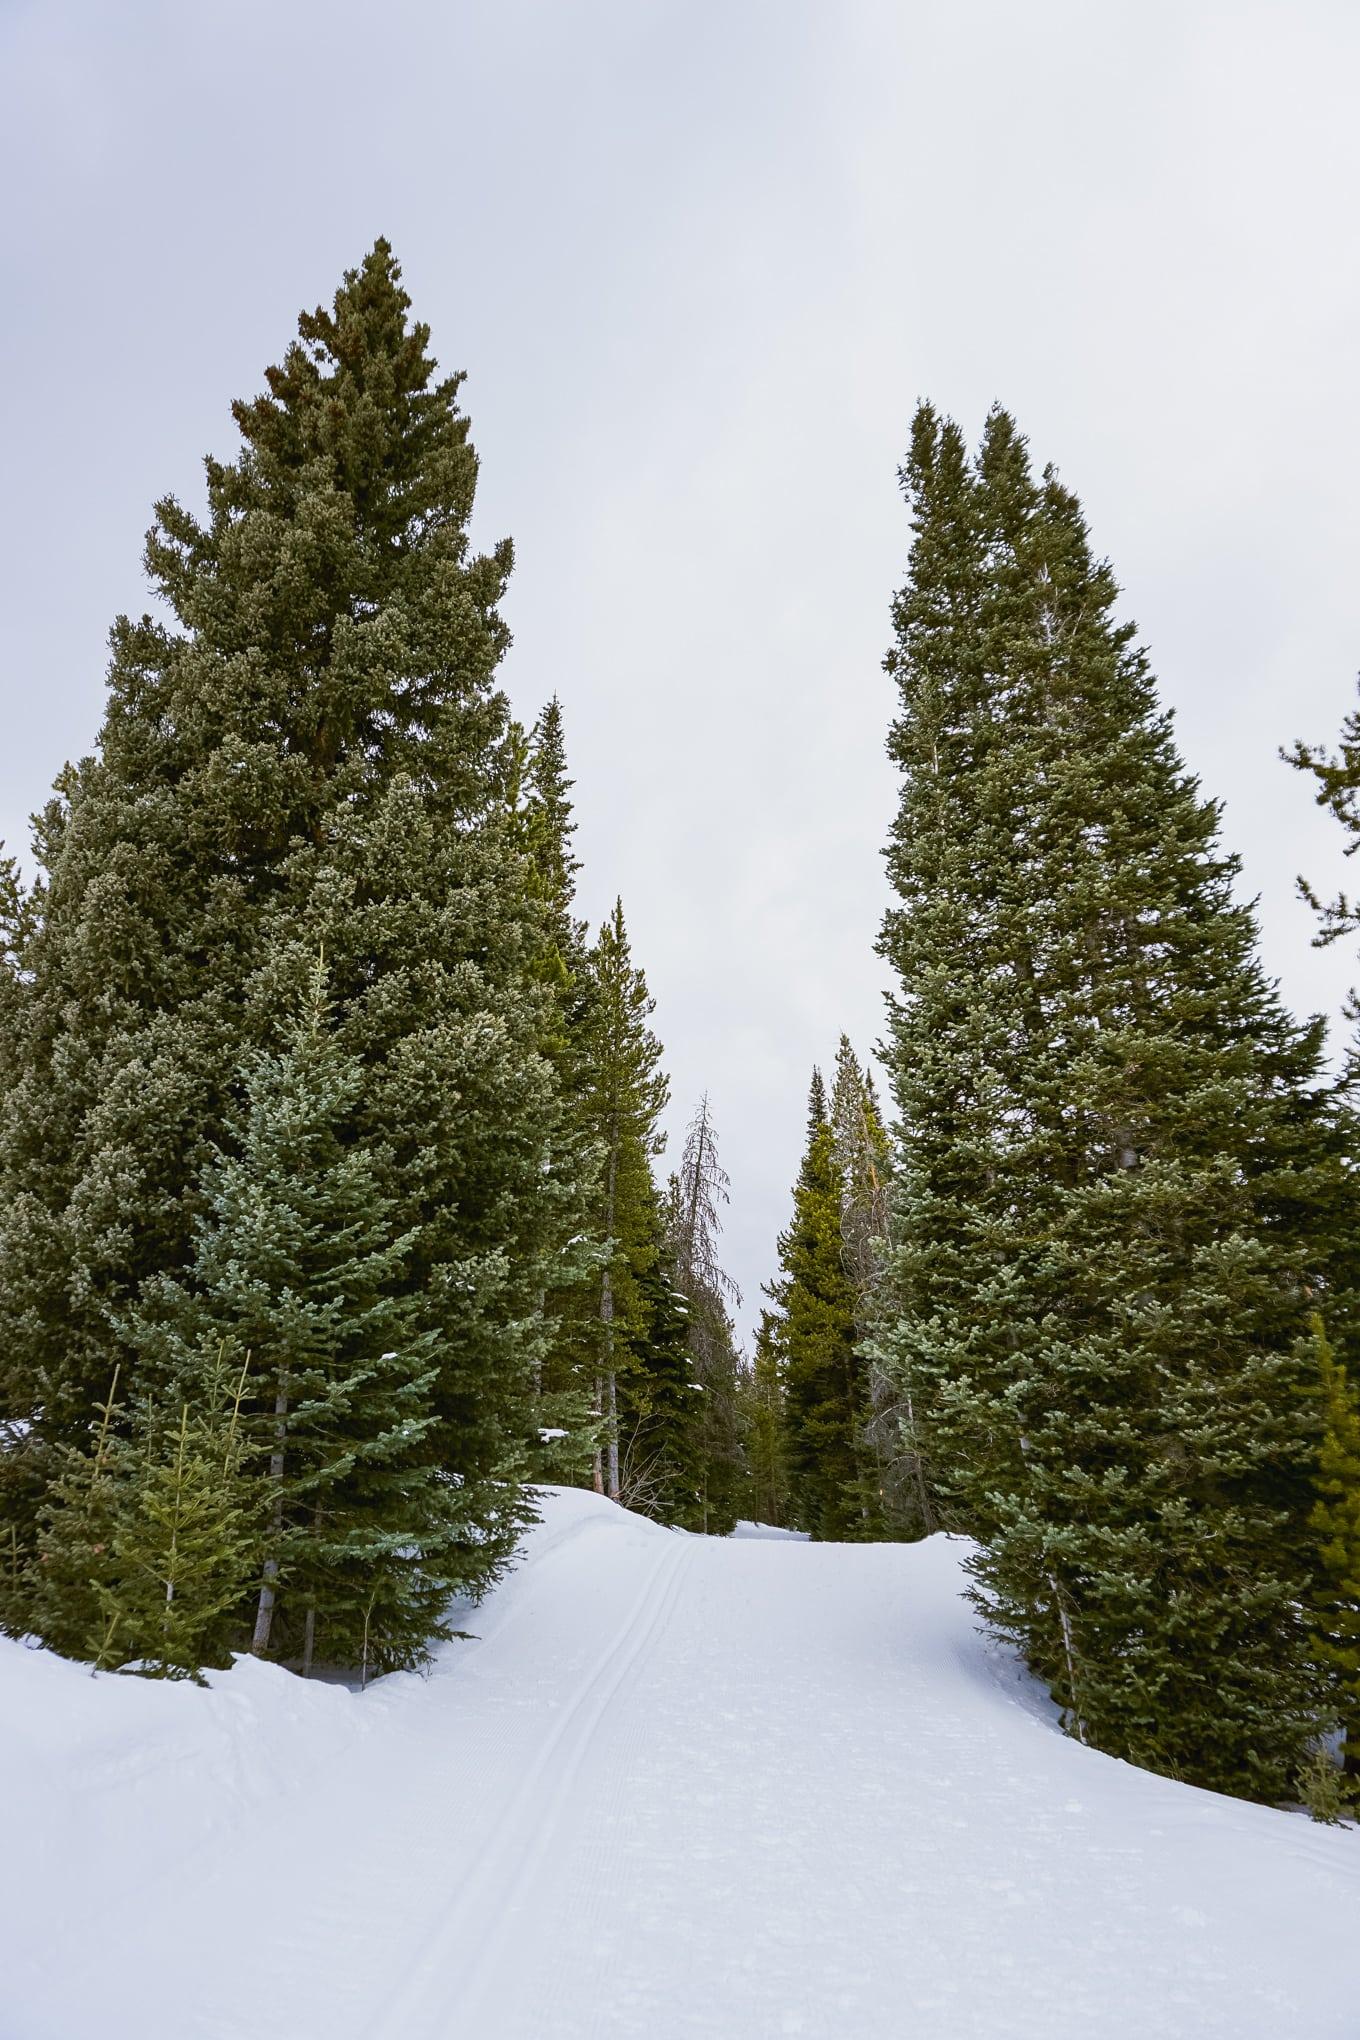 Trees on the most beautiful ski resort